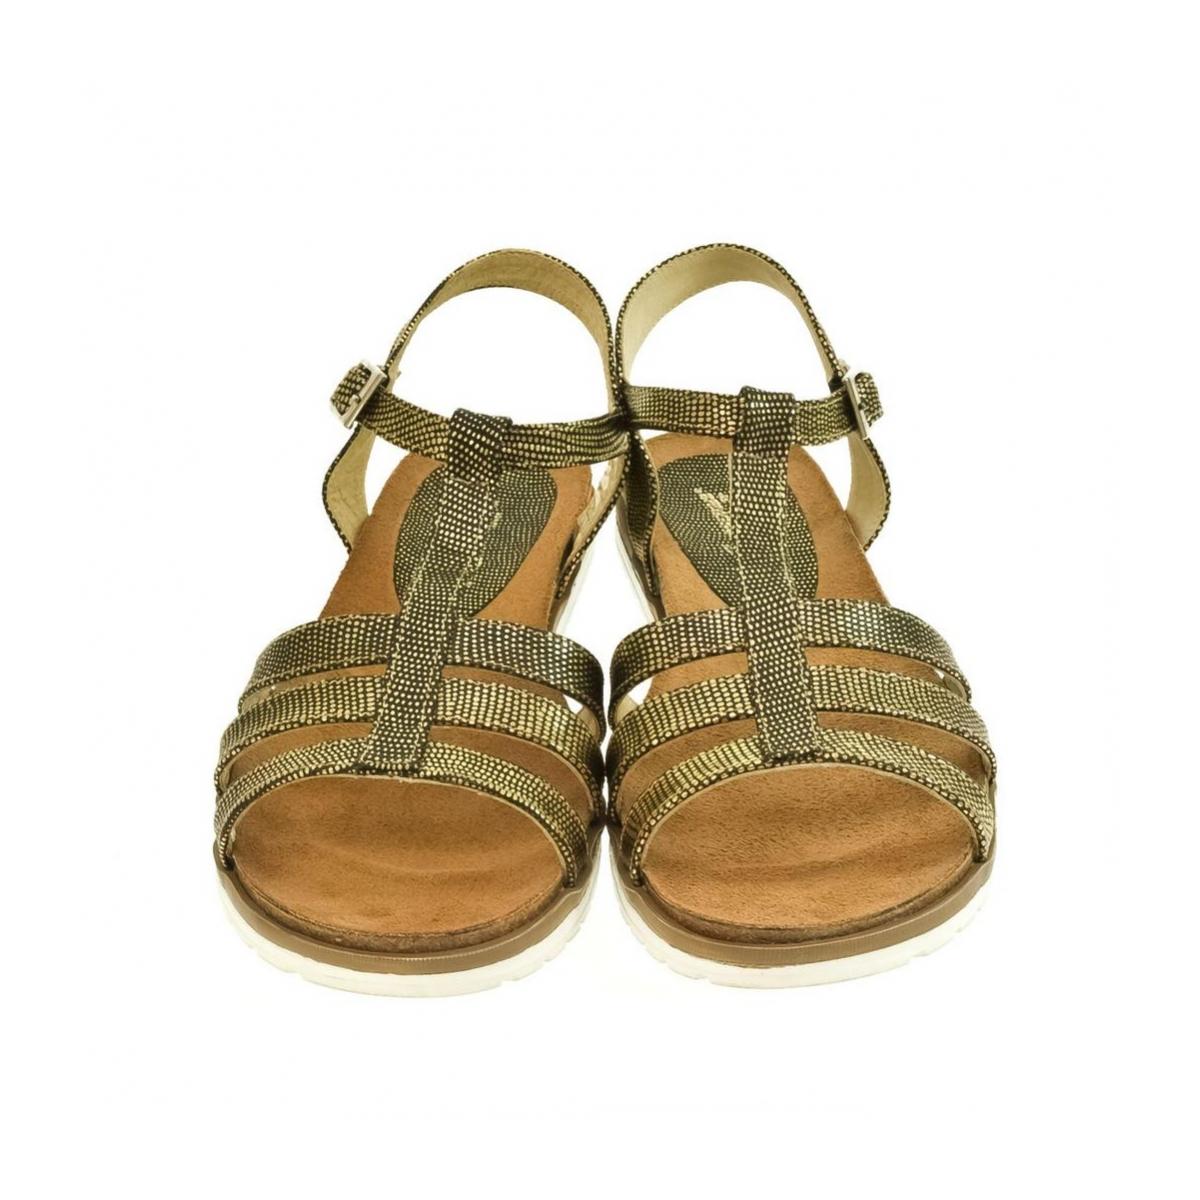 27c1ac0206e80 Zlaté kožené nízke sandále LEA | Johnc.sk